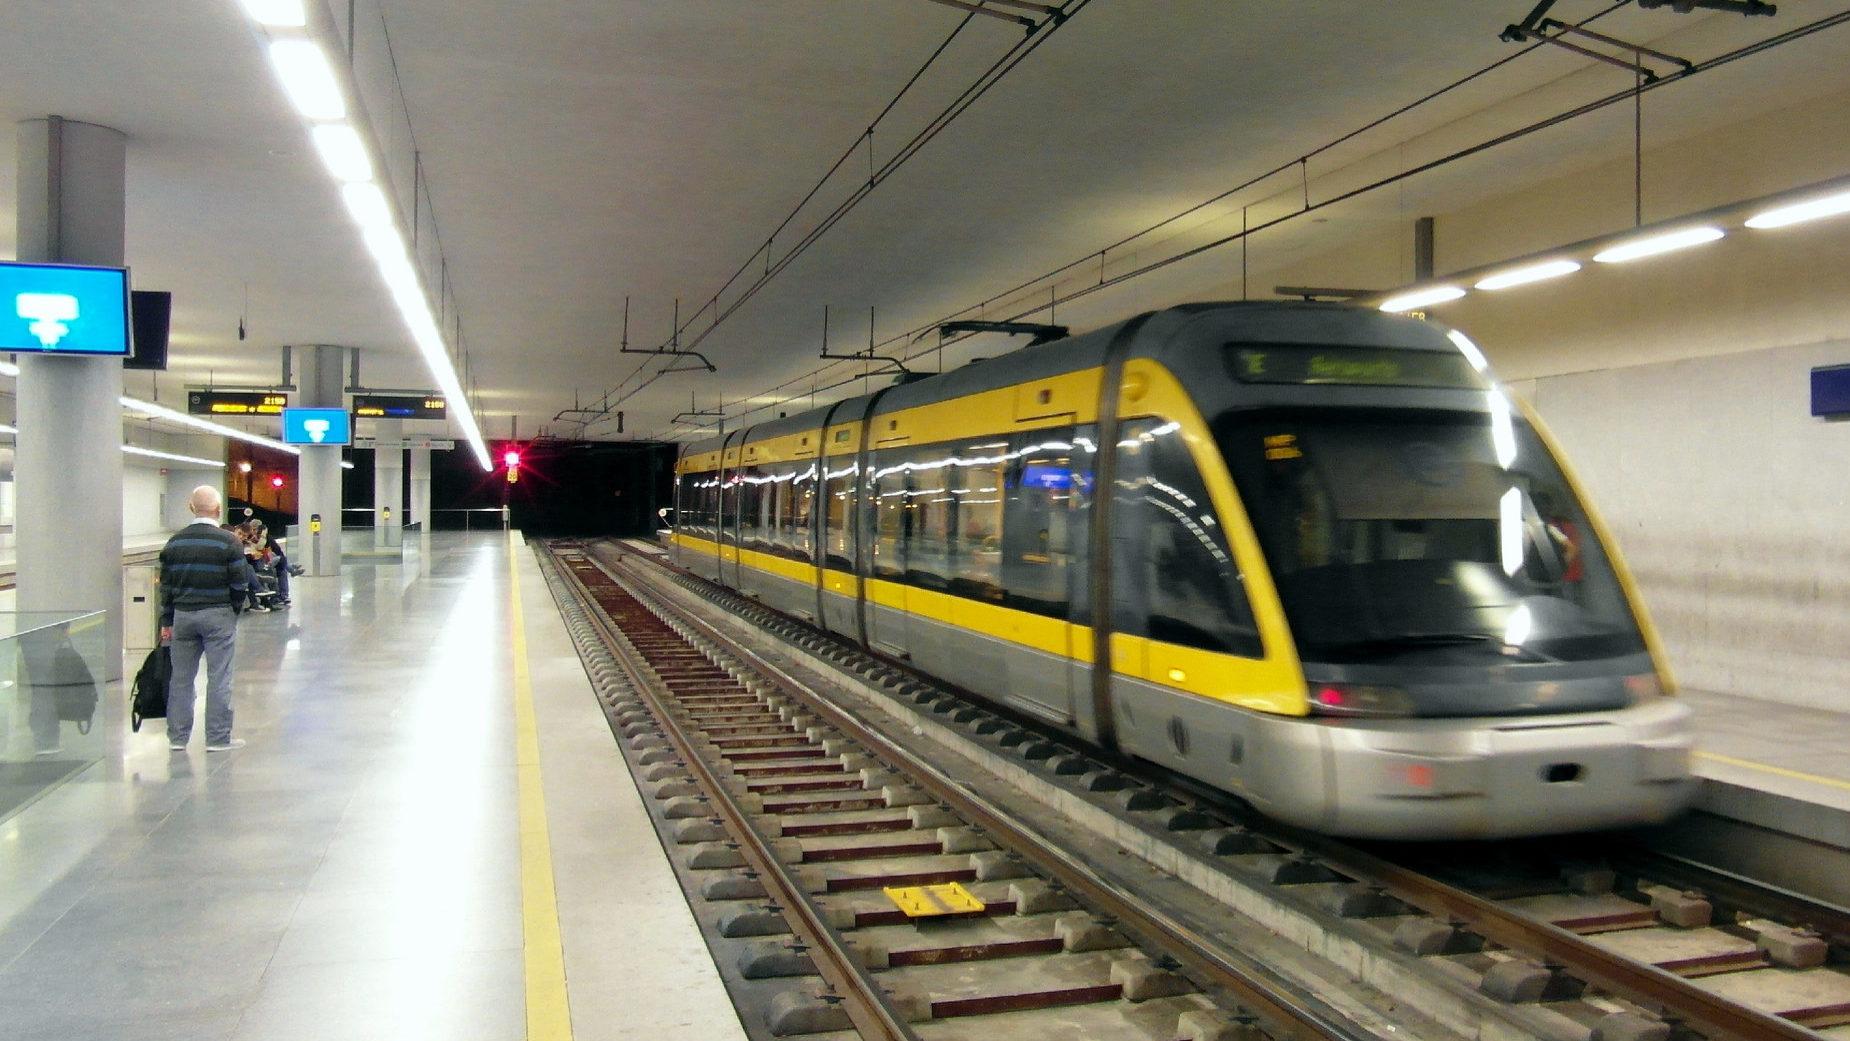 Empresa chinesa vai produzir 18 novos comboios para o Metro do Porto